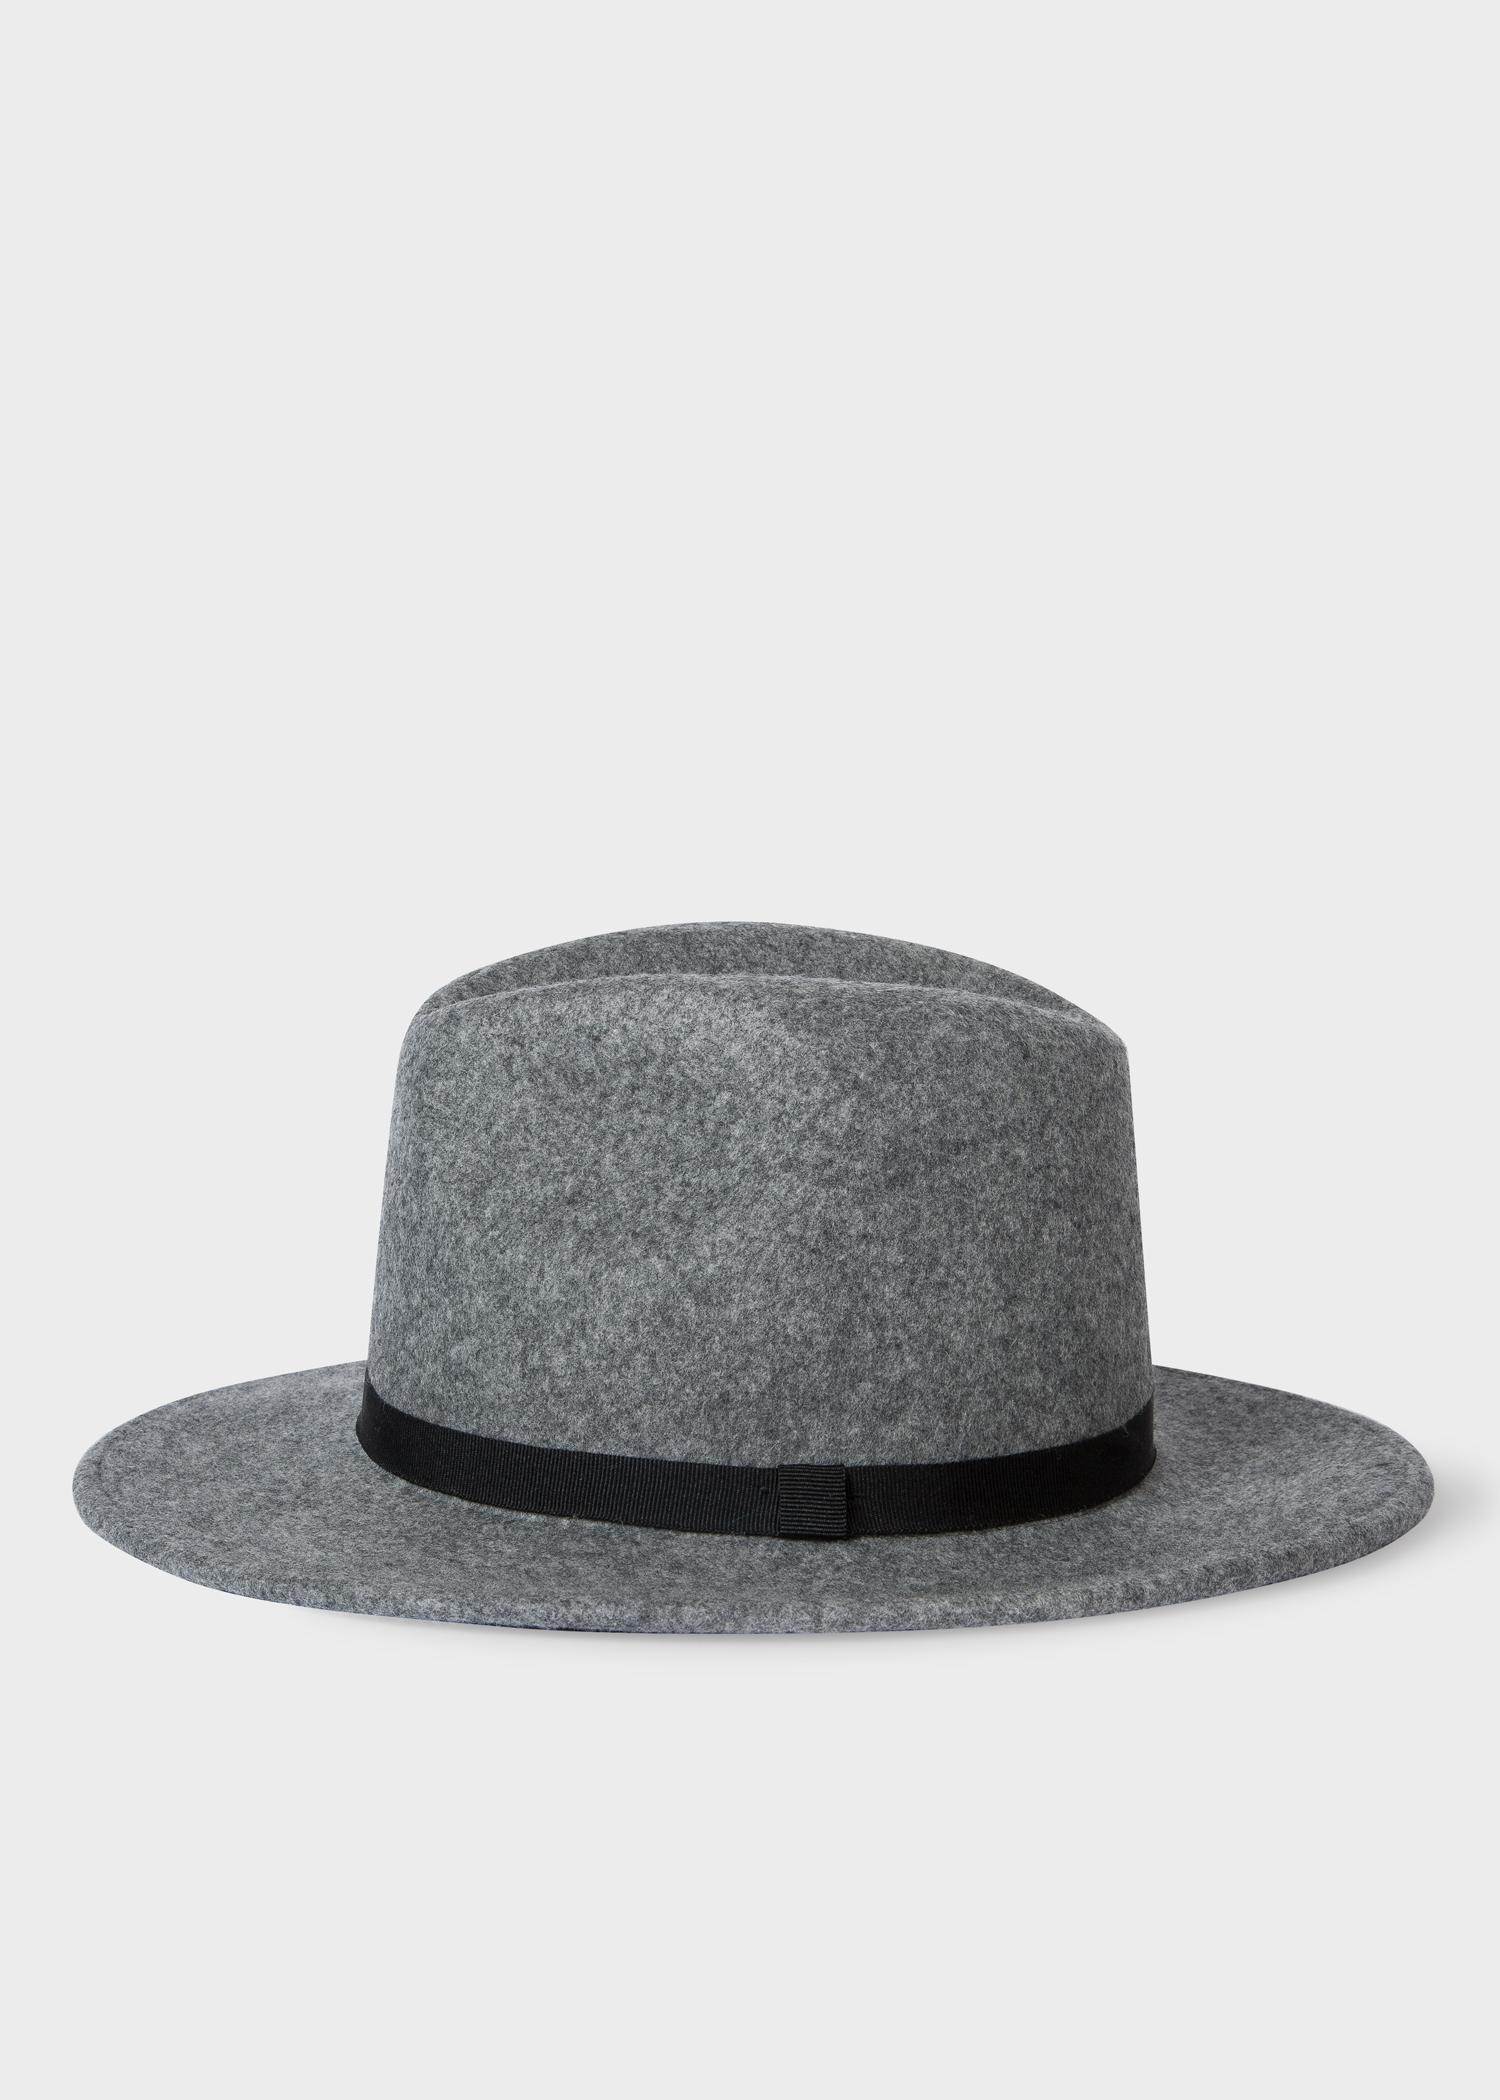 8d17ba1e4ec26b Side View - Women's Grey Wool Felt Fedora Hat With Black Headband Paul Smith